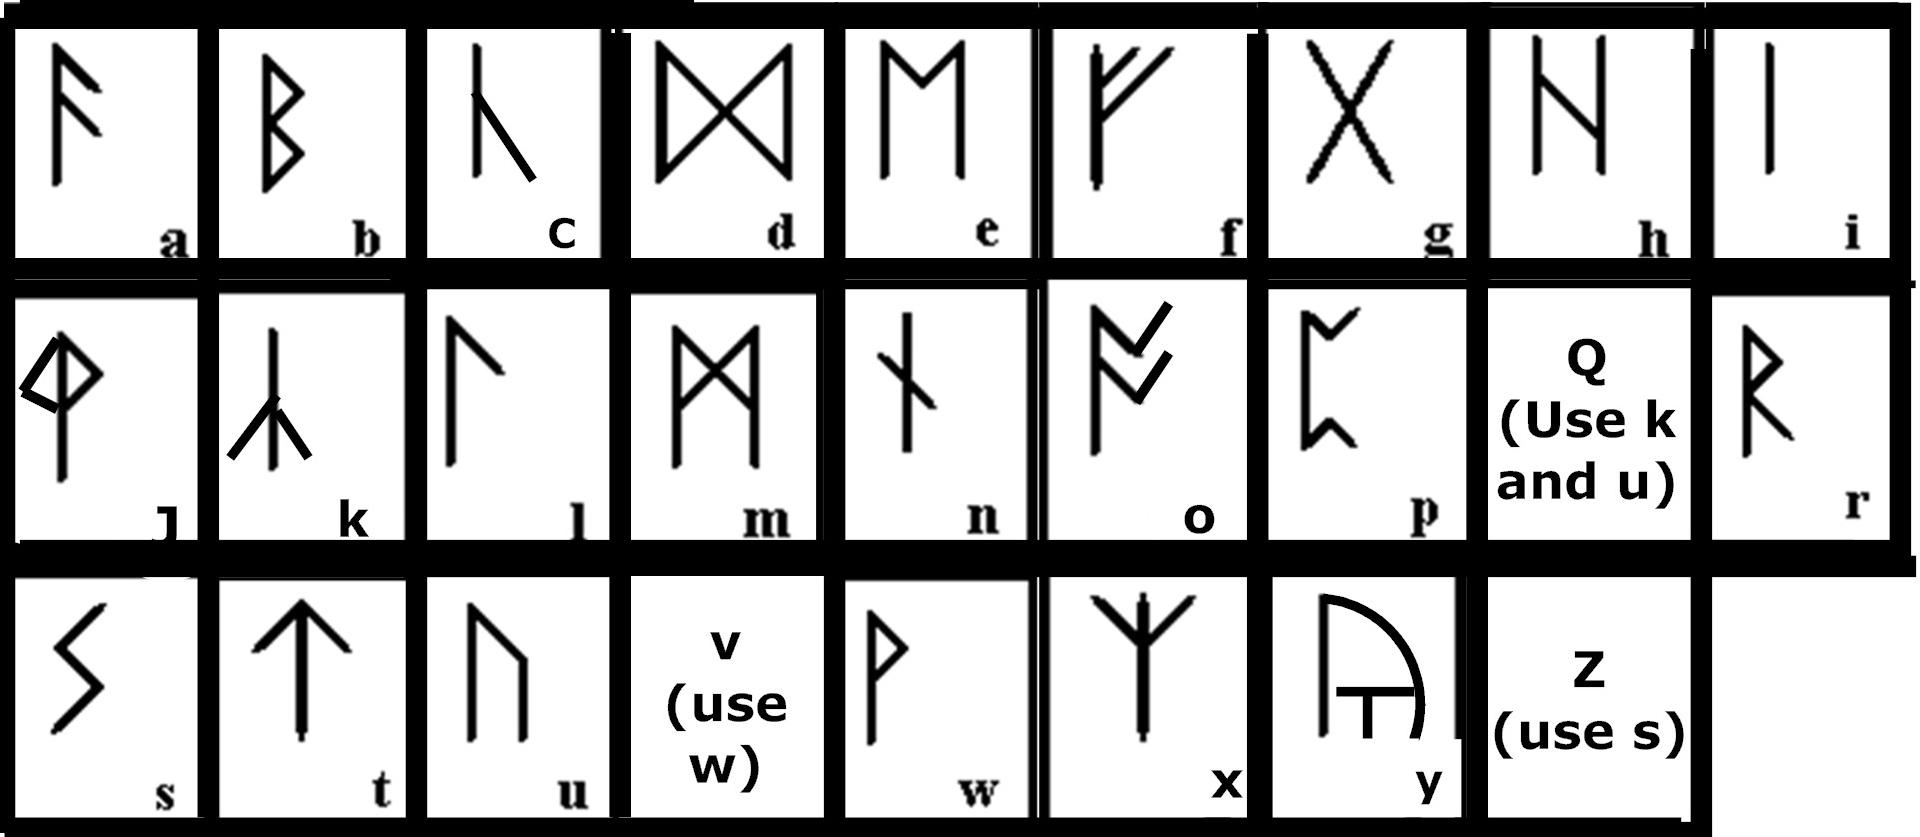 Anglo-Saxons Runes Alphabet Activity Sheet